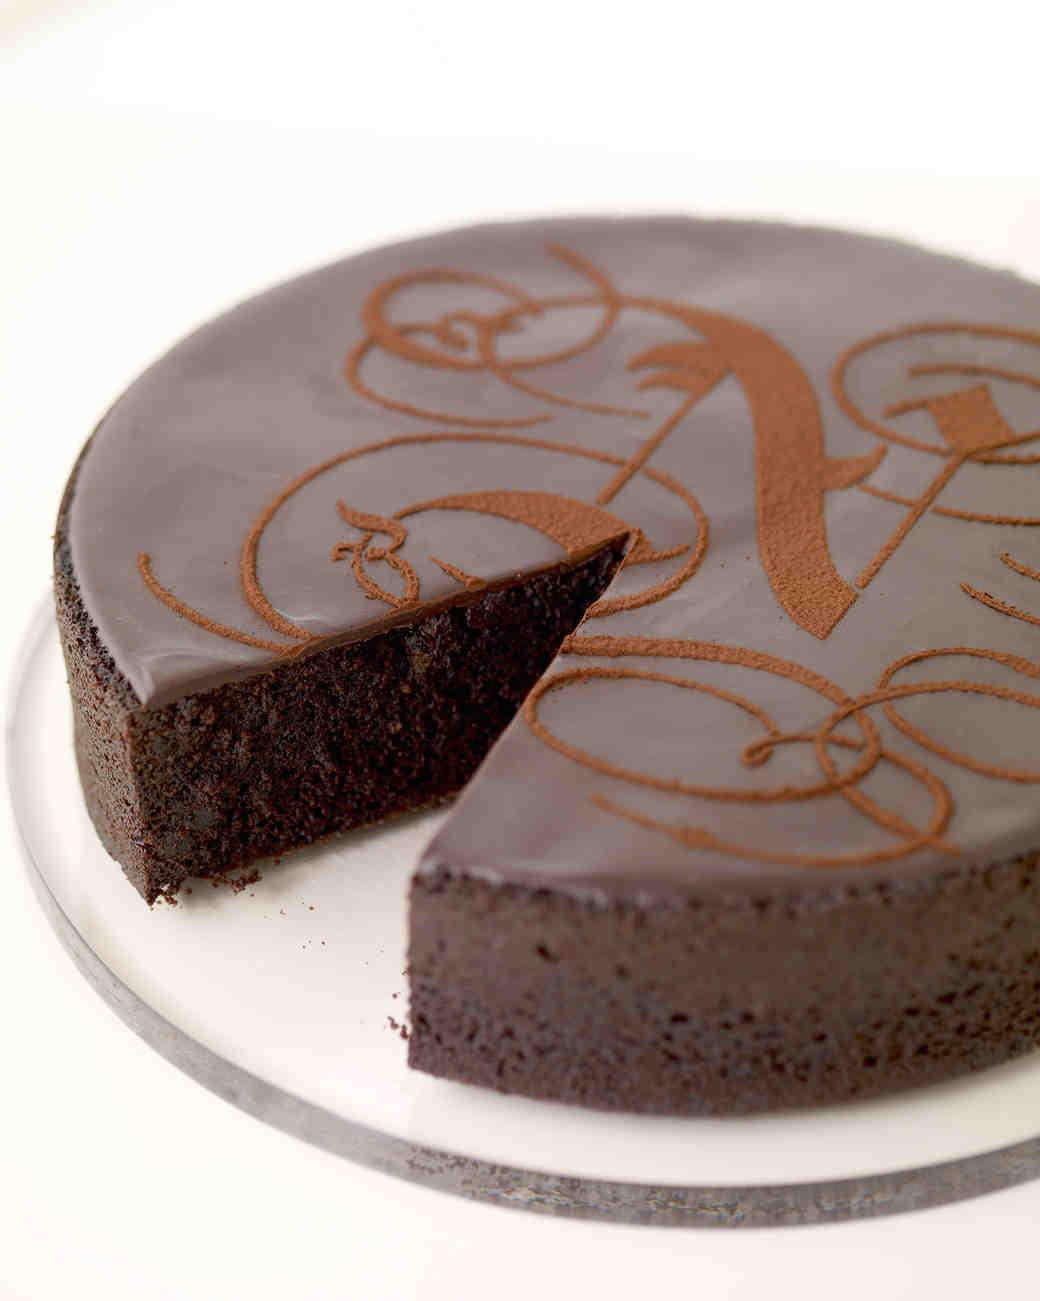 boozy-desserts-chocolate-stout-cake-wd103407-0814.jpg